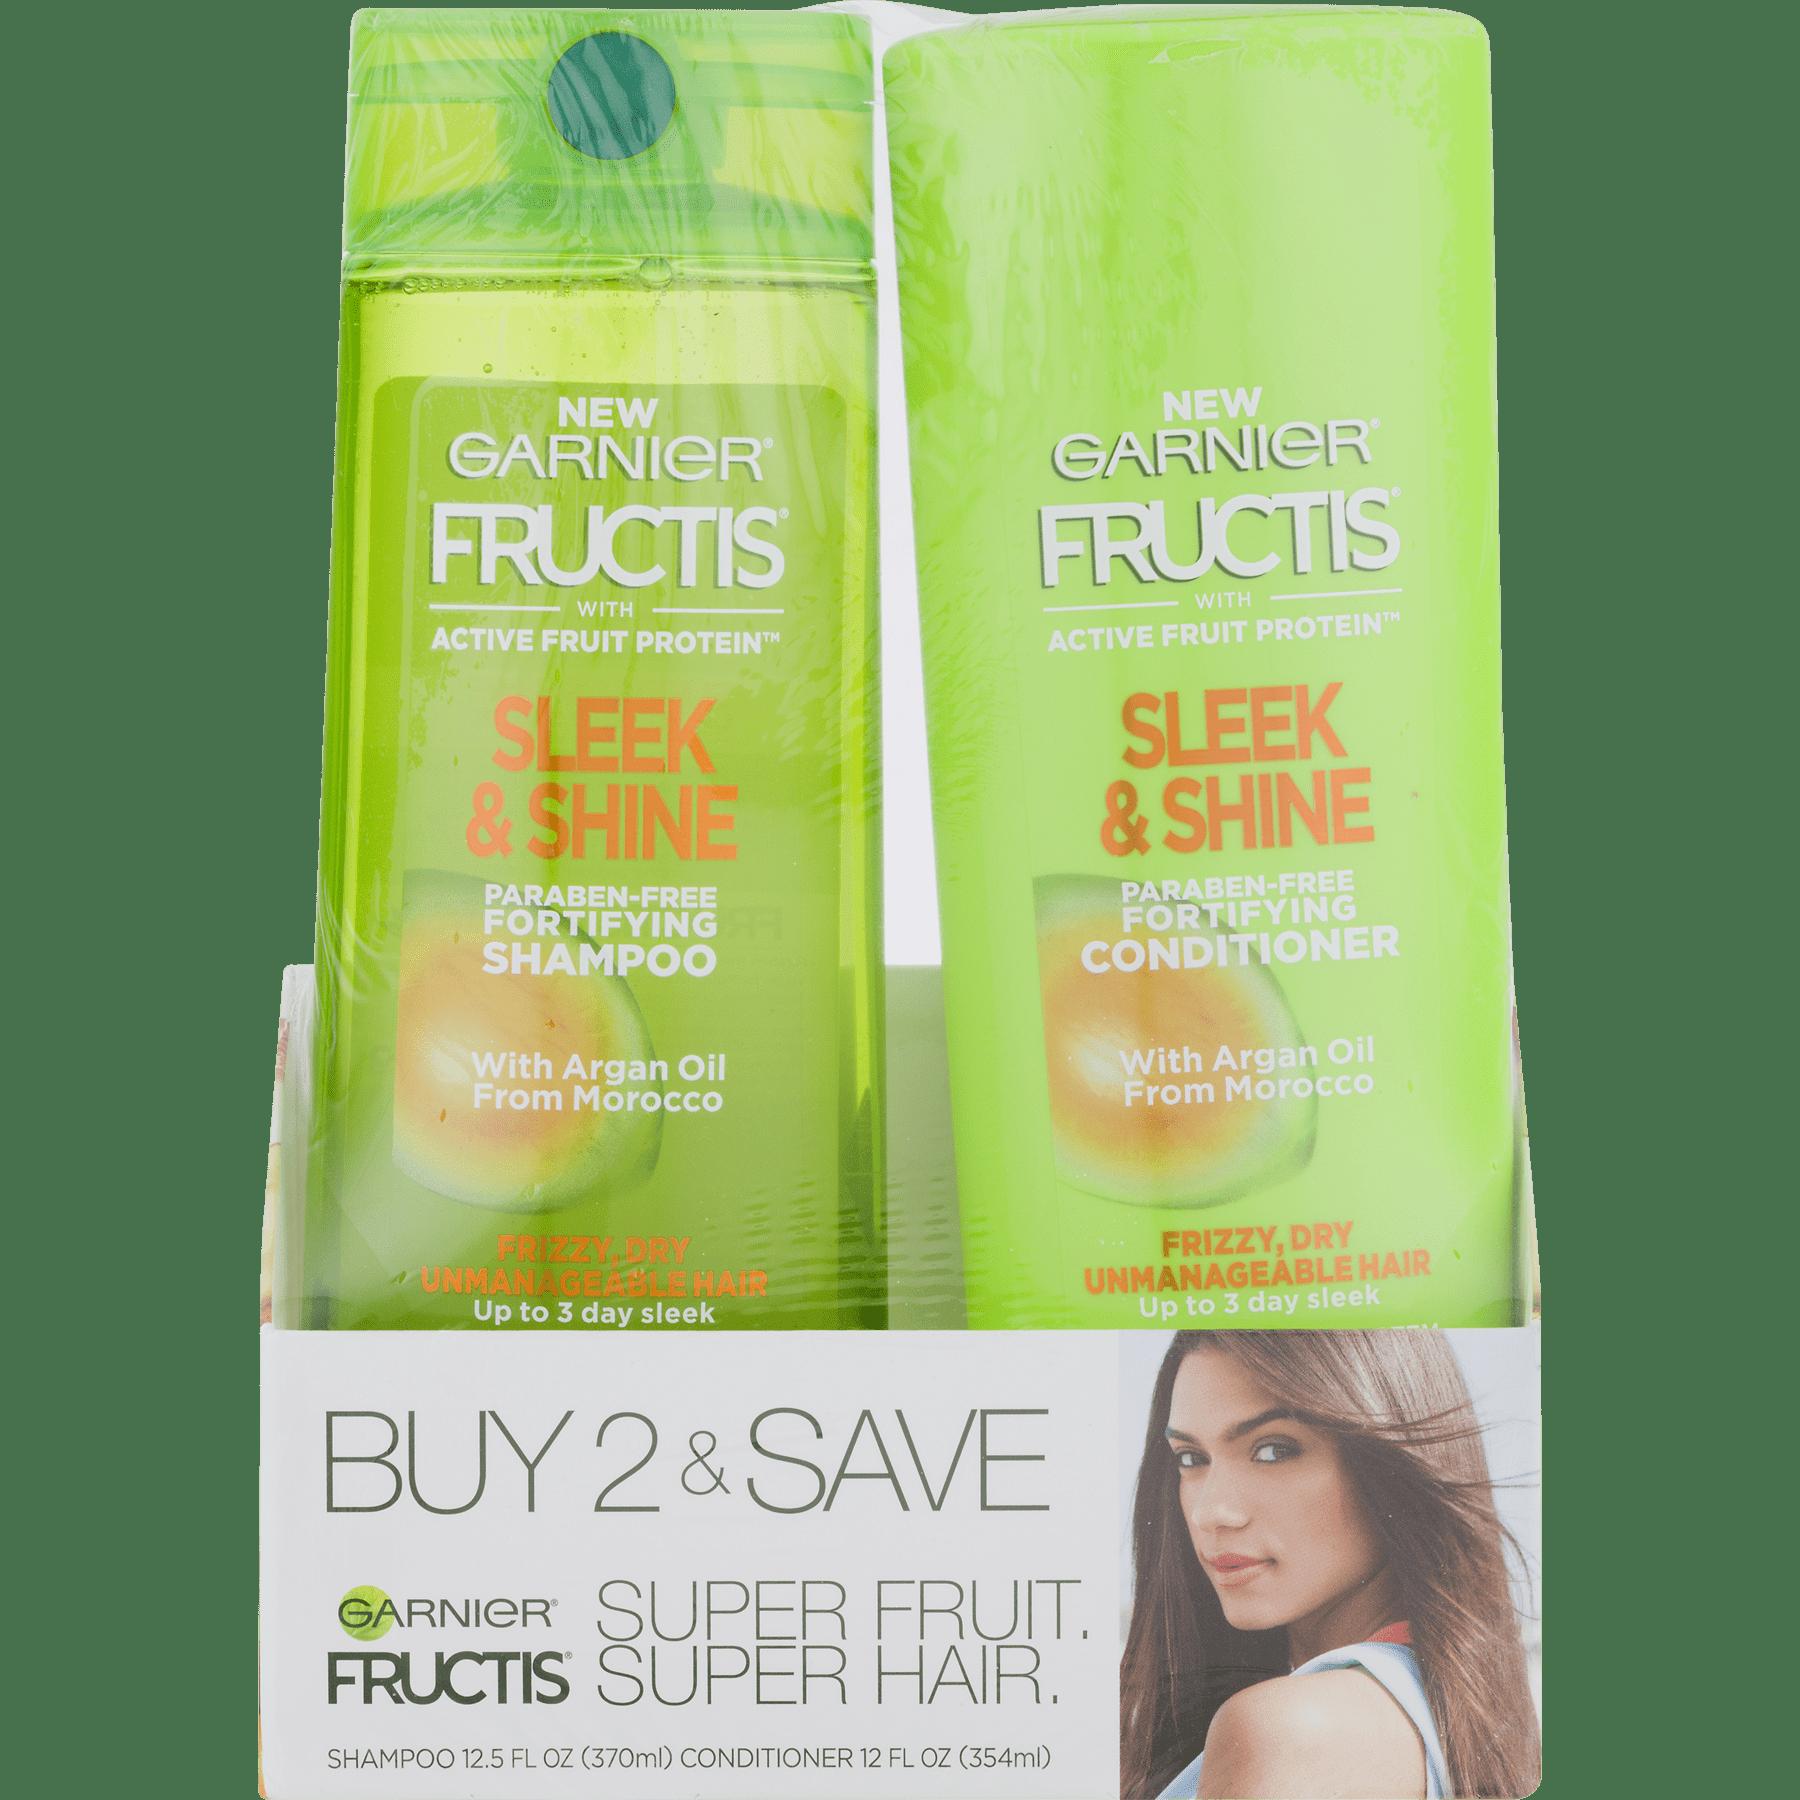 Garnier Fructis Sleek & Shine Everyday, Shampoo & Conditioner